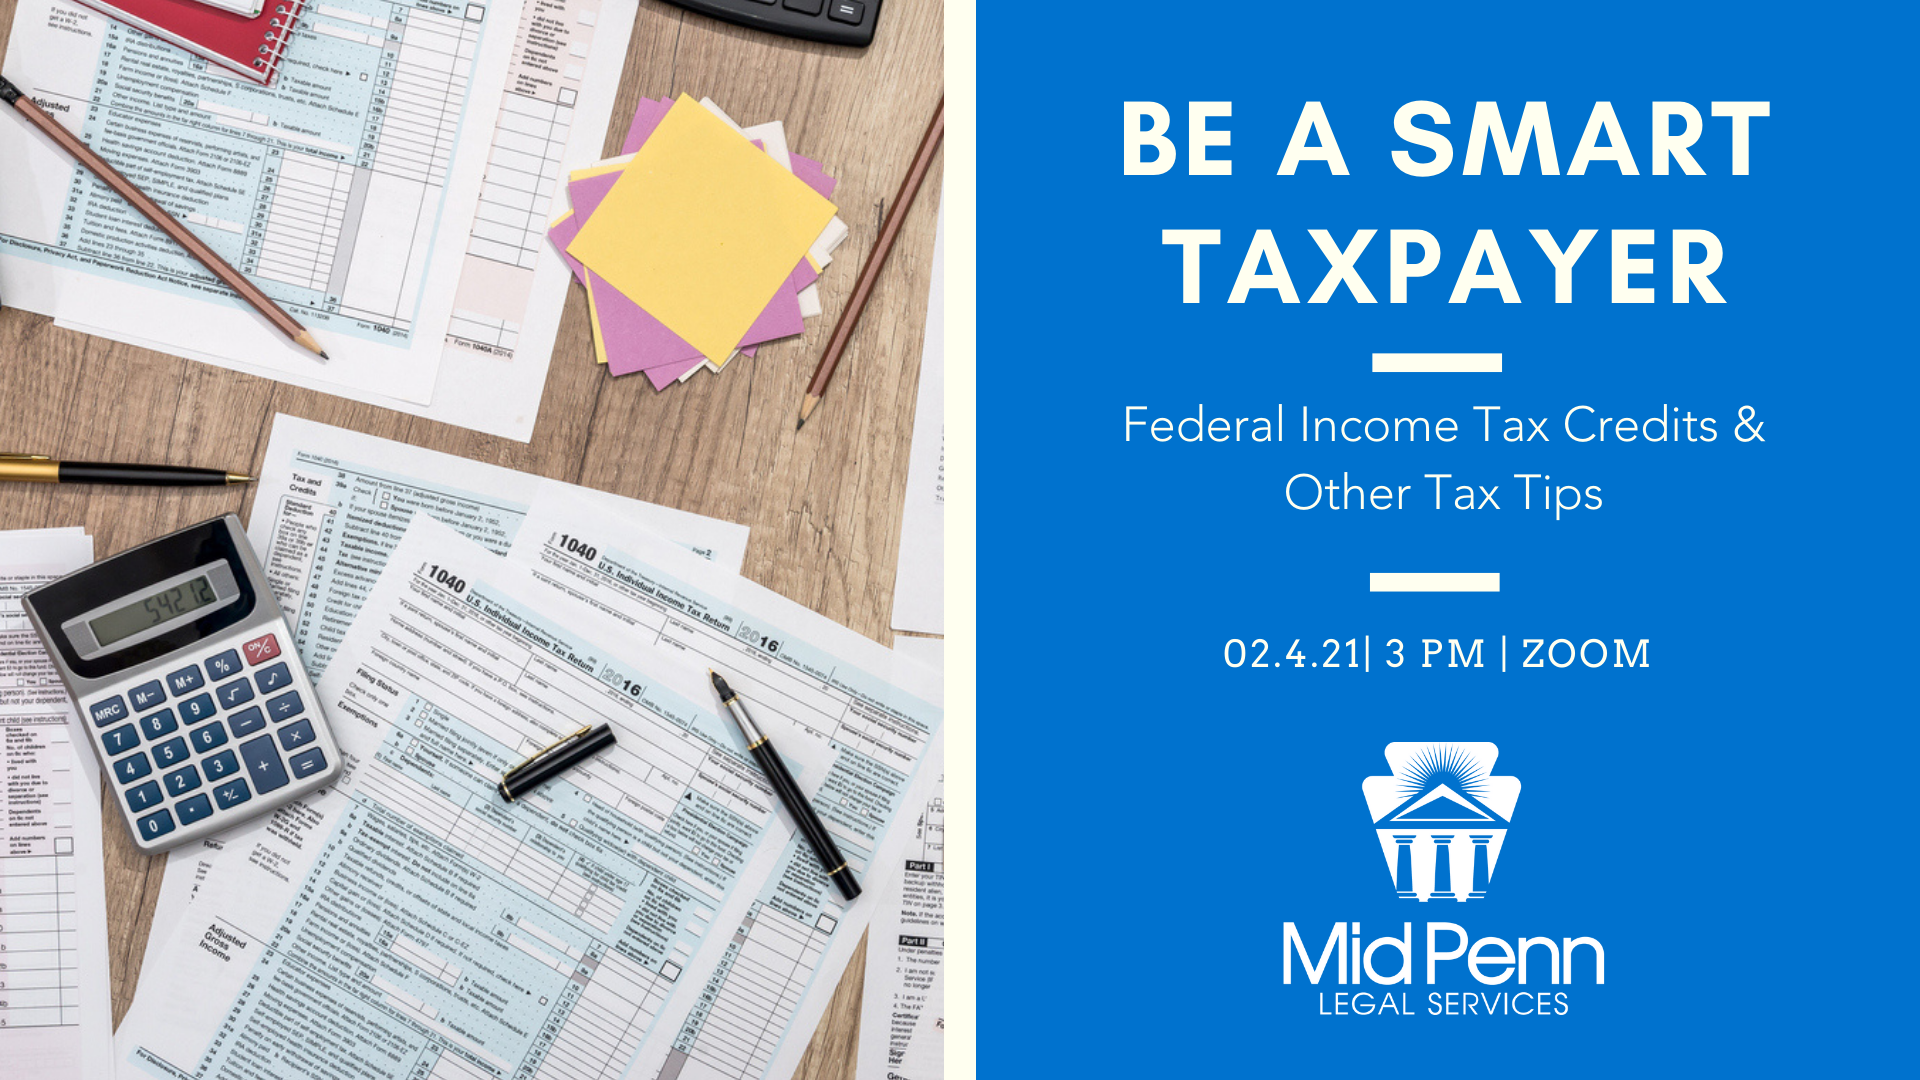 Webinar February 4: Be A Smart Taxpayer